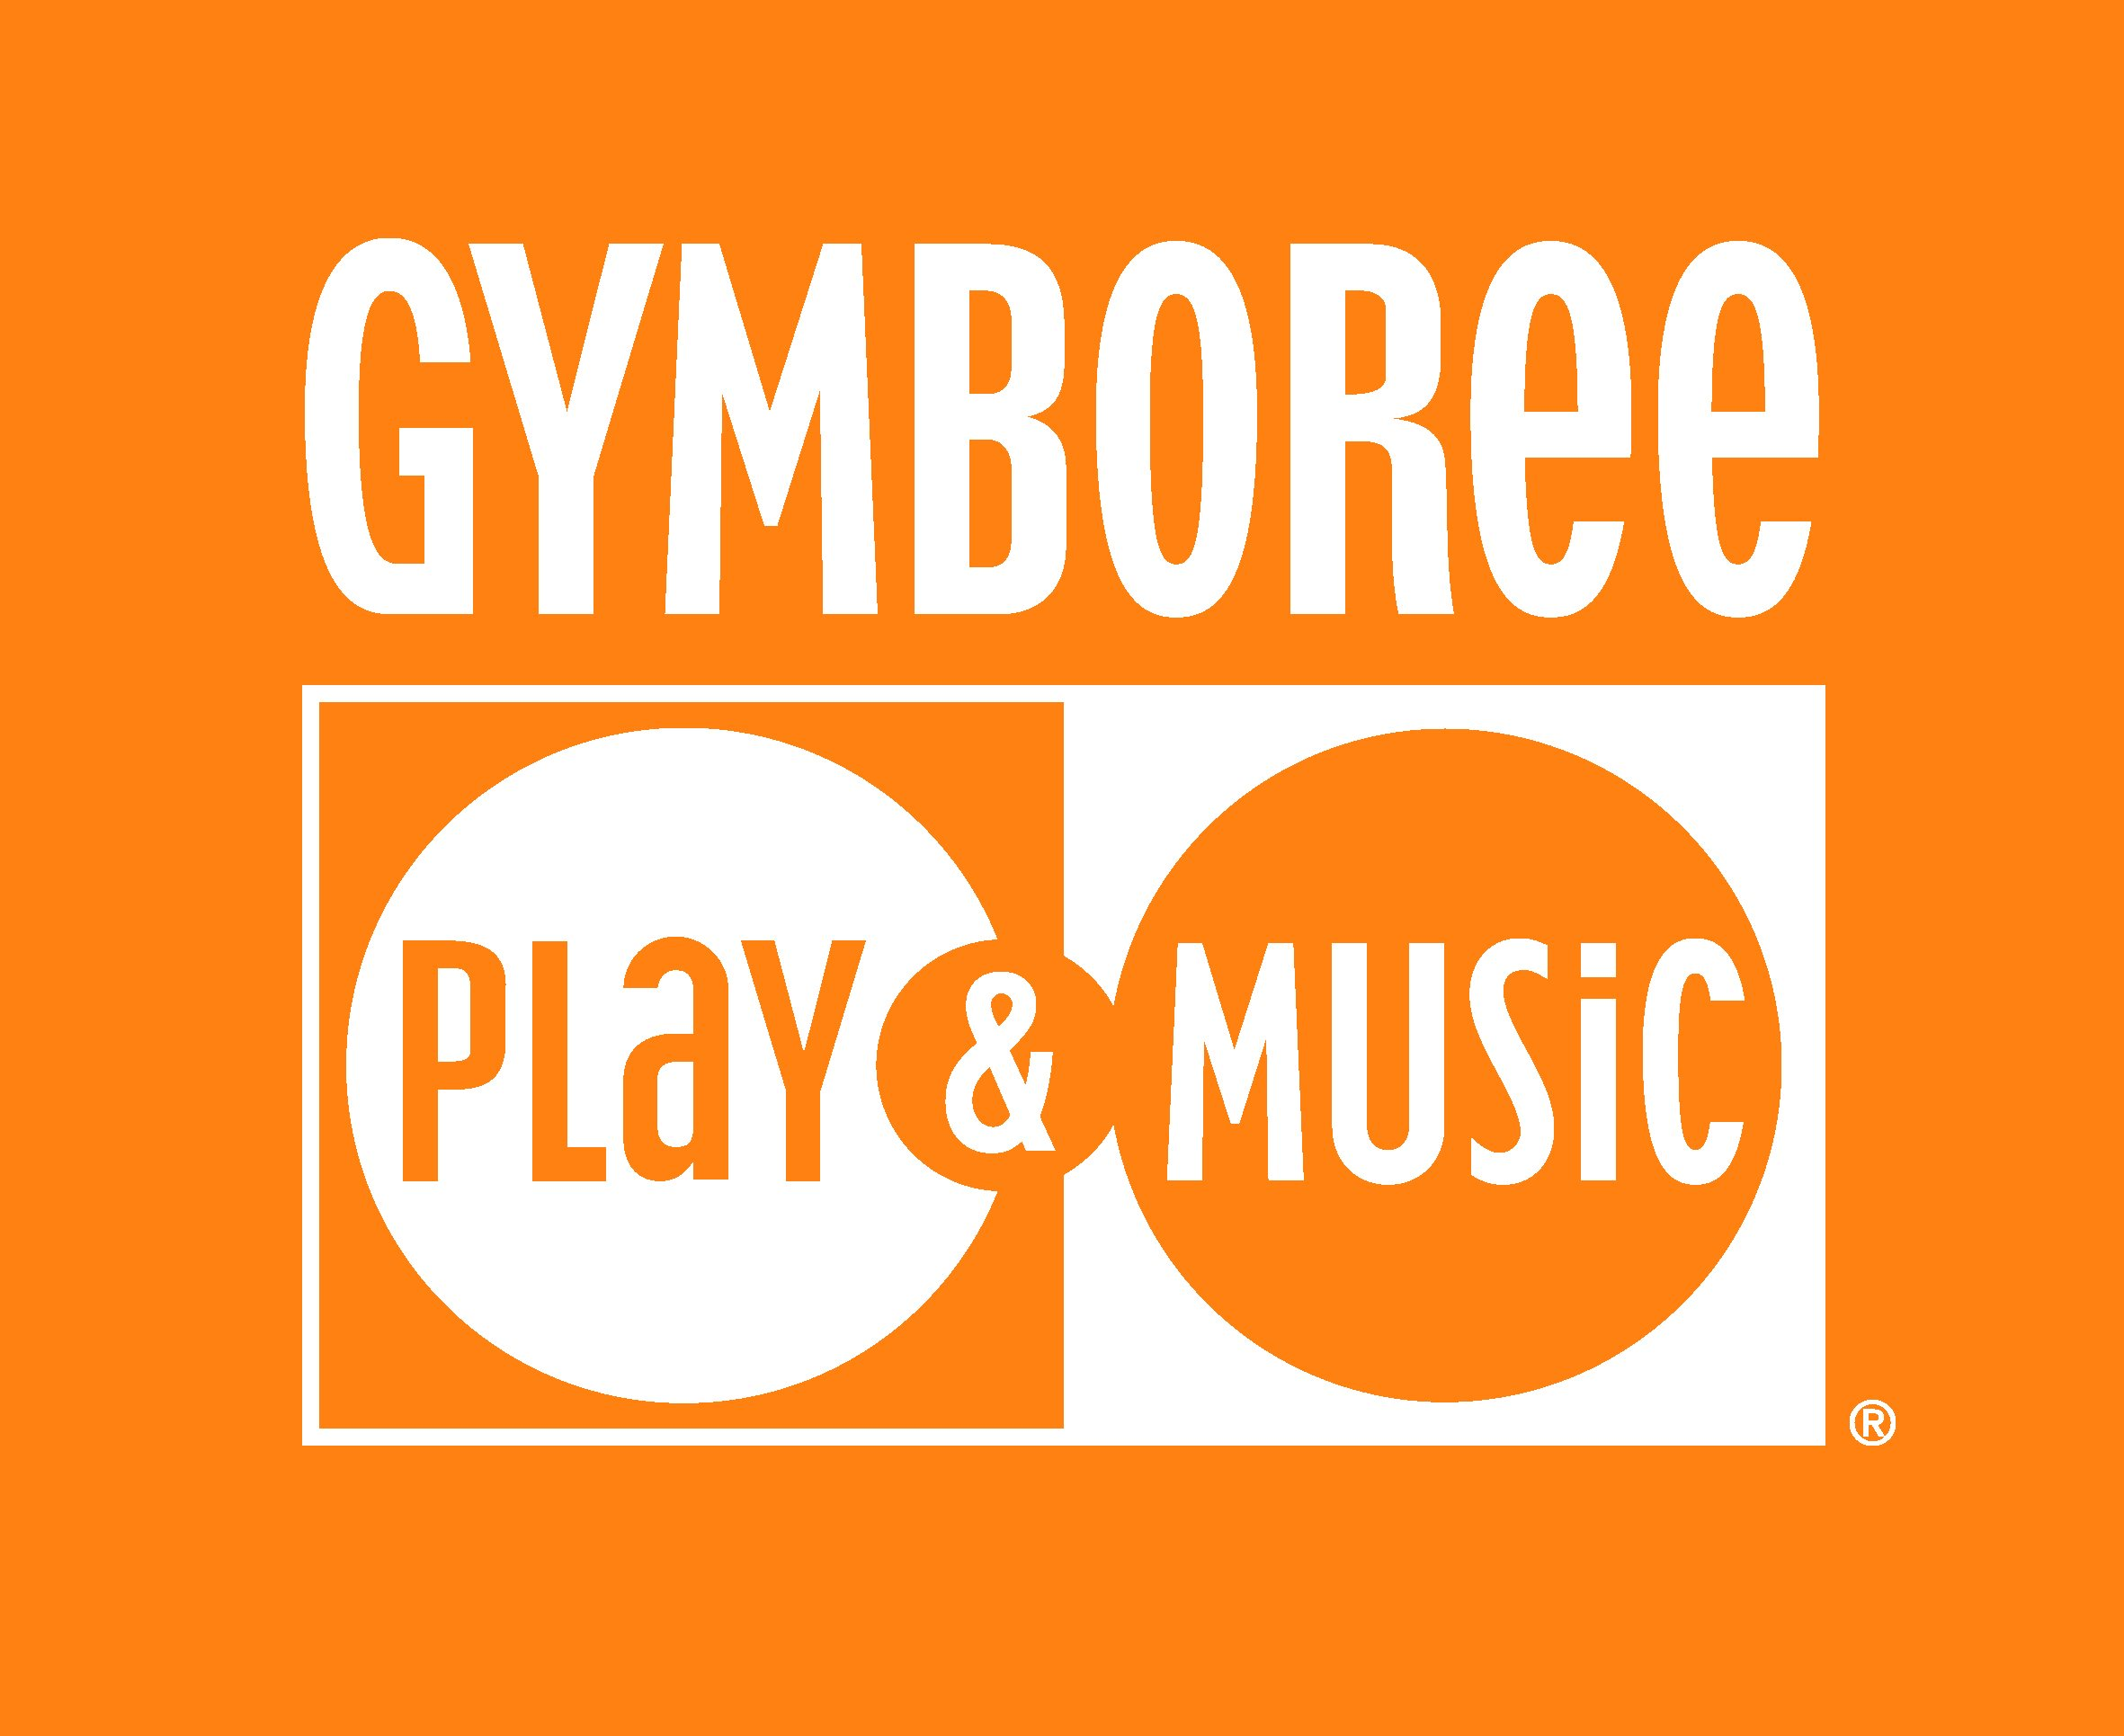 Gymboree Play & Music, Eastwood